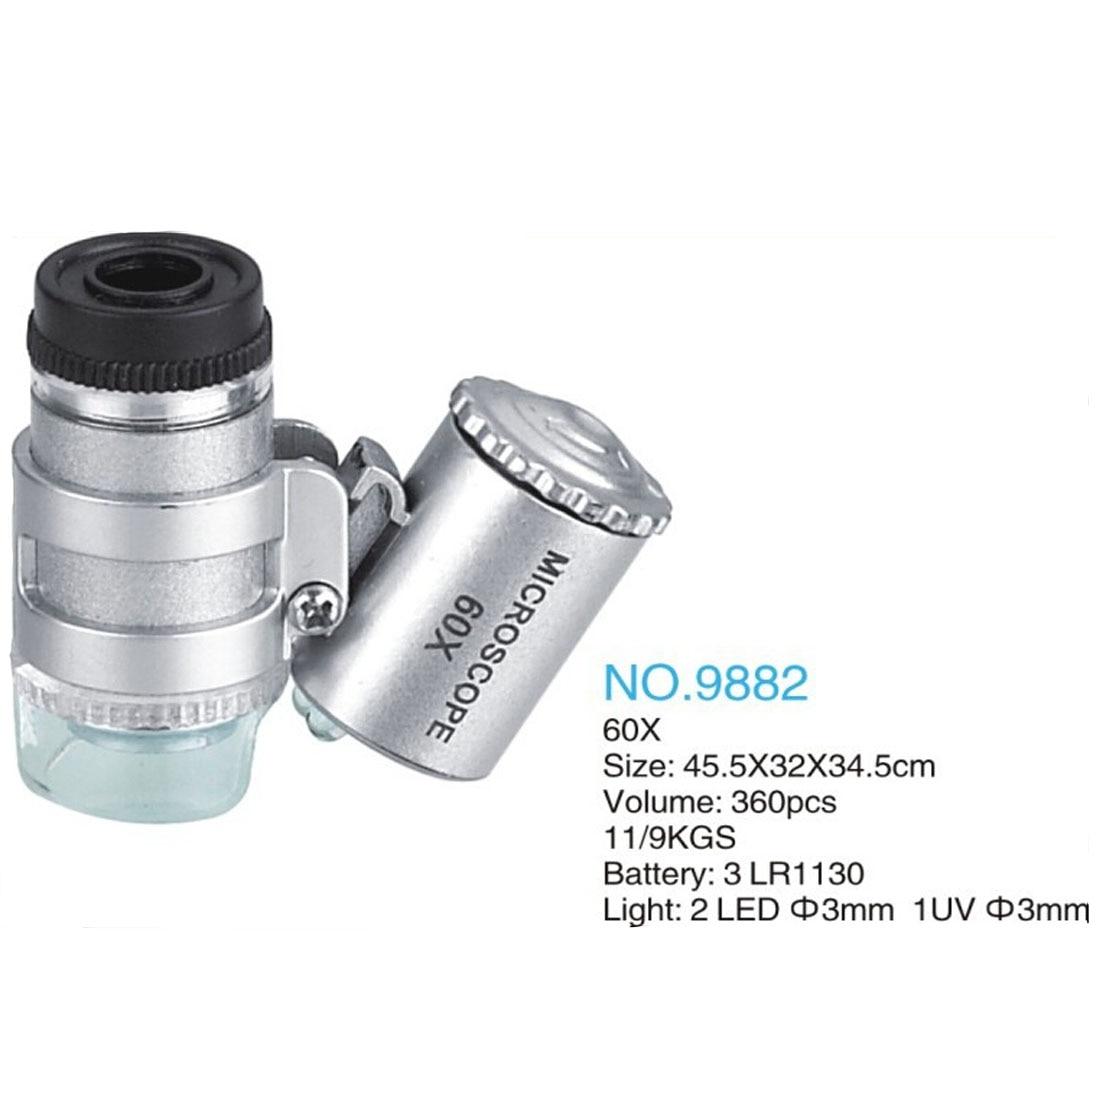 60X Mini Microscope Jeweler Loupe Lens Illuminated Magnifier Glass 3 LED With UV Light